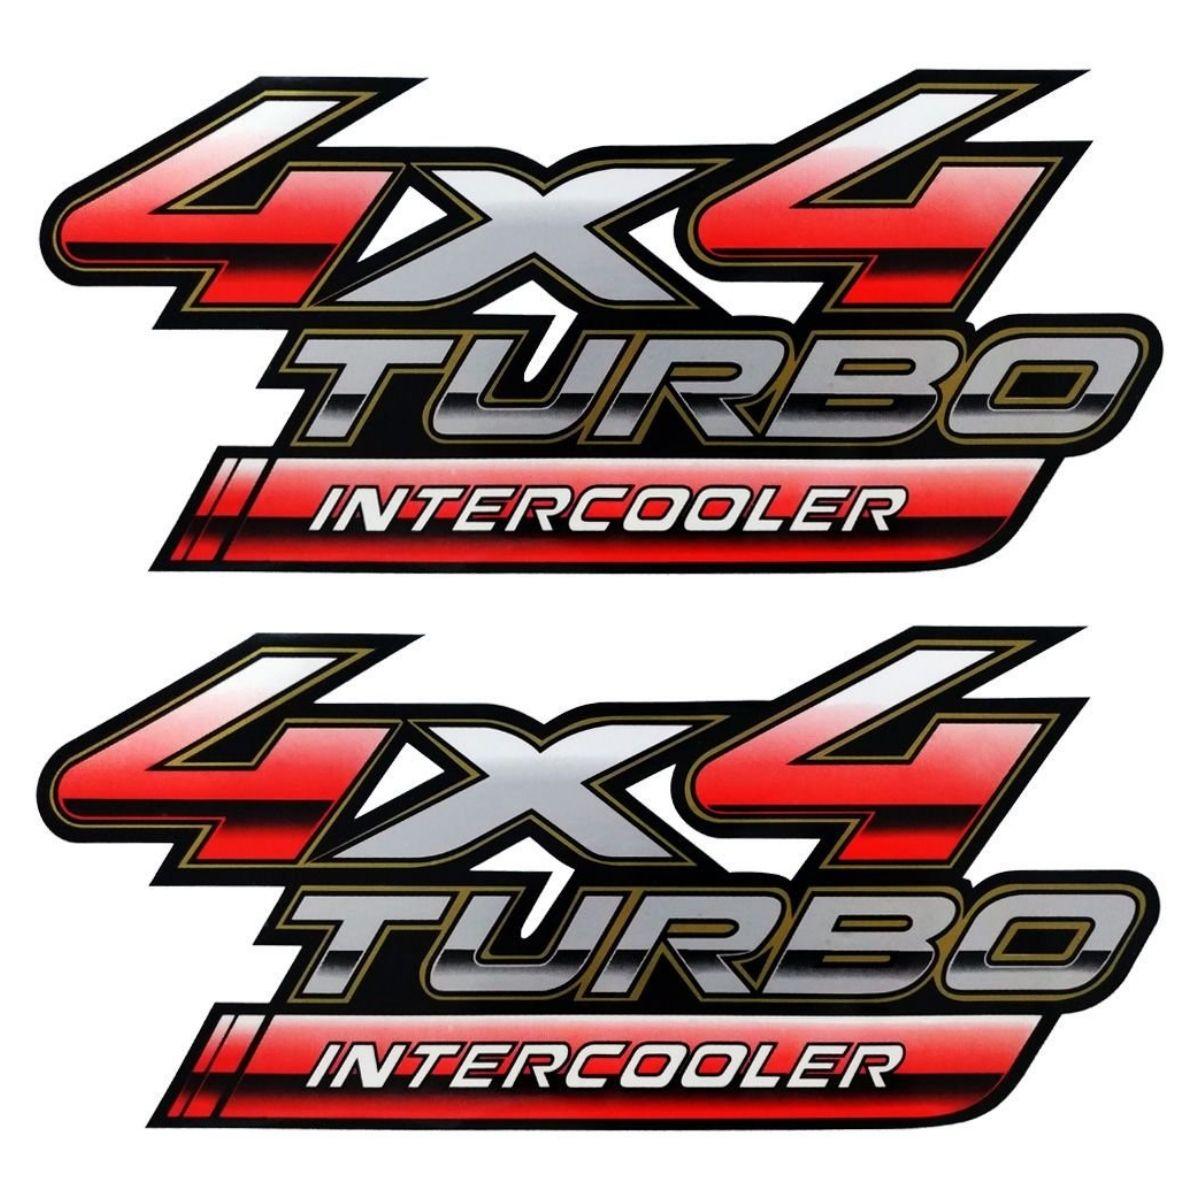 Adesivo Toyota Hilux 4x4 Intercooler Turbo 2009/2012 Par